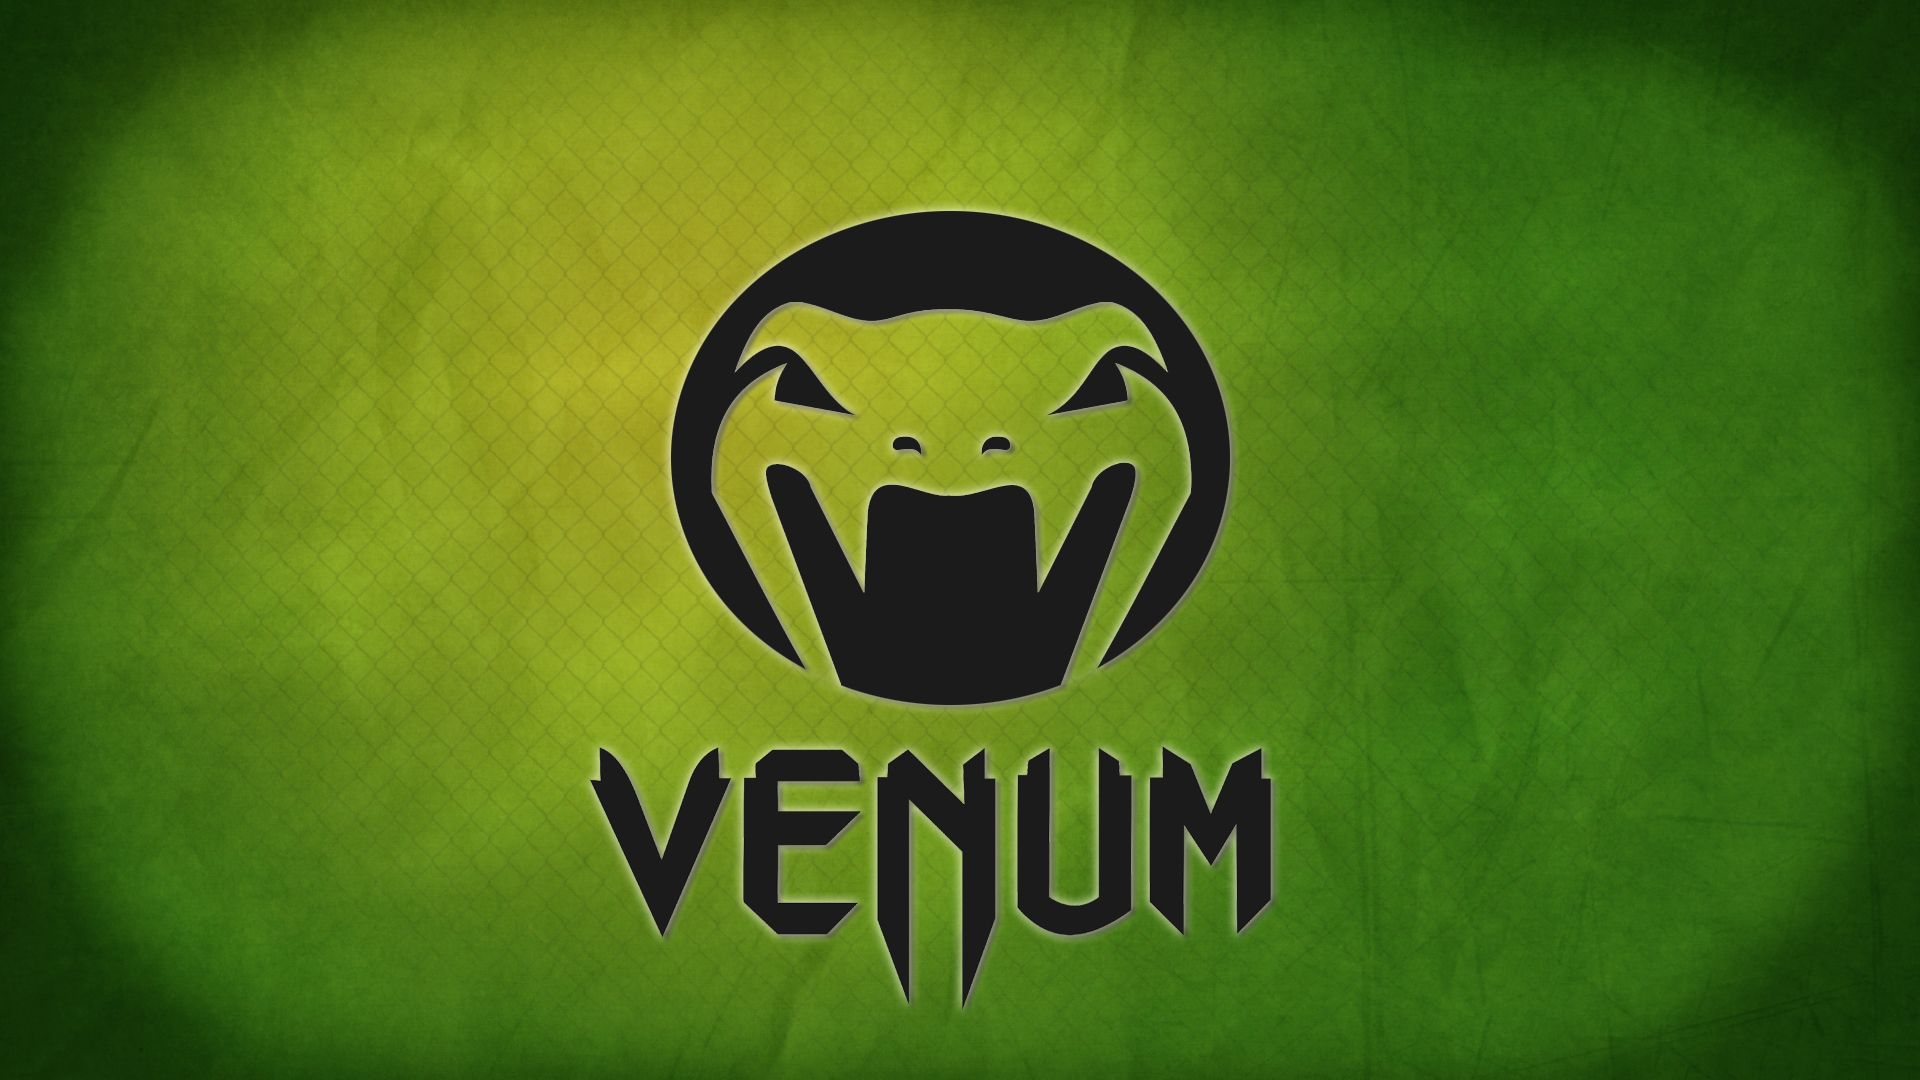 ekipirovka ufc mma logo fights venum 2012 brands